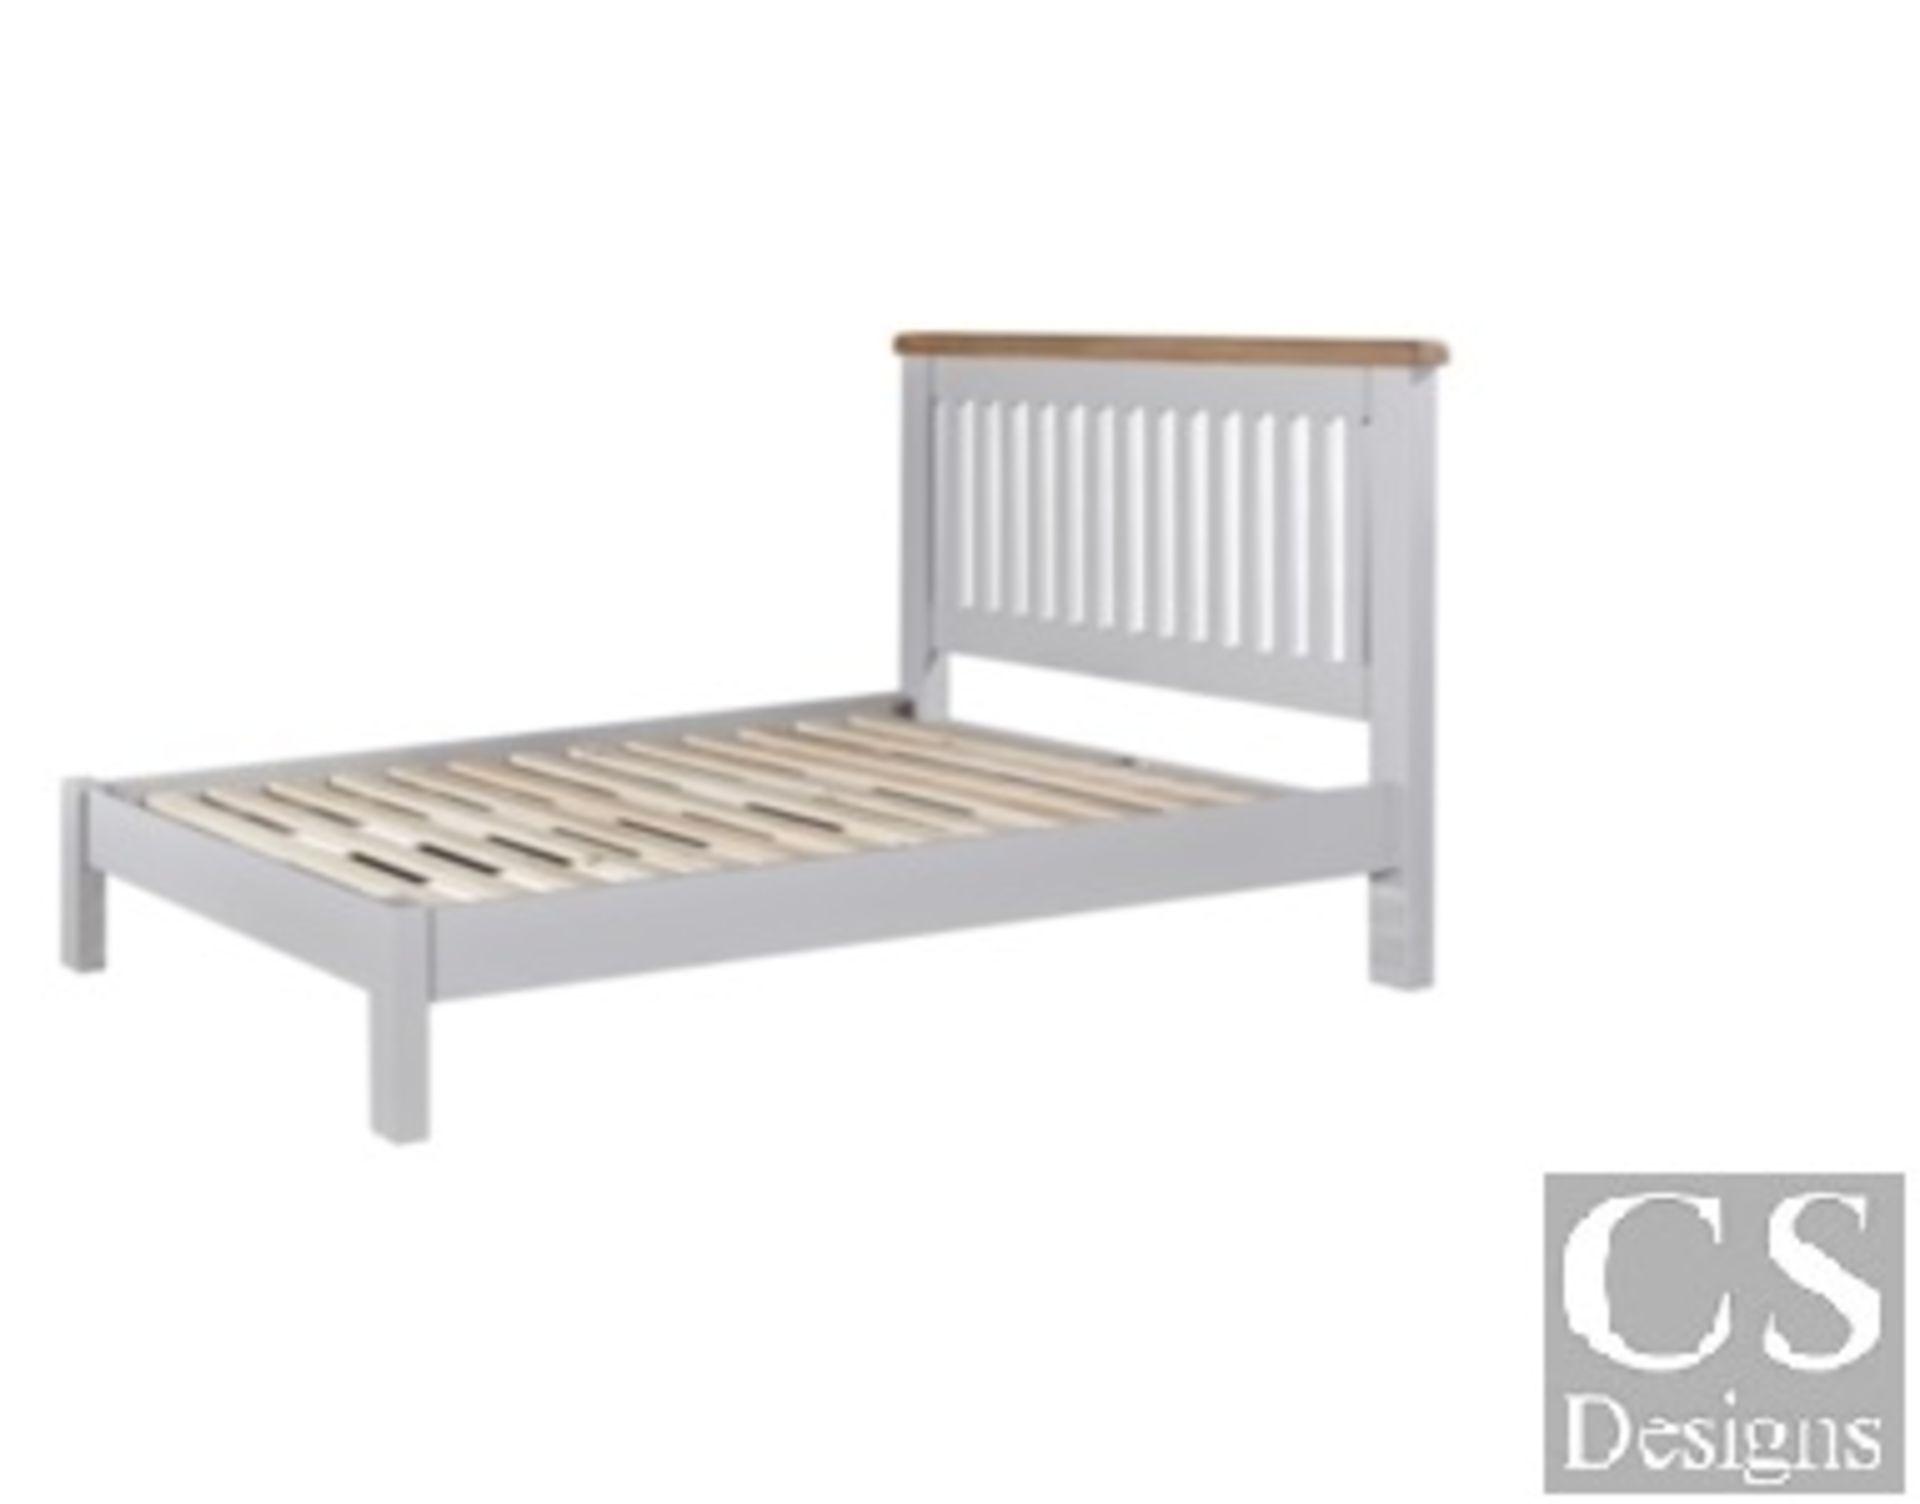 "+ VAT Brand New CS Designs ""Windsor"" Natural Oak Double Bed Frame - Brand New Stunning Quality - - Image 3 of 3"